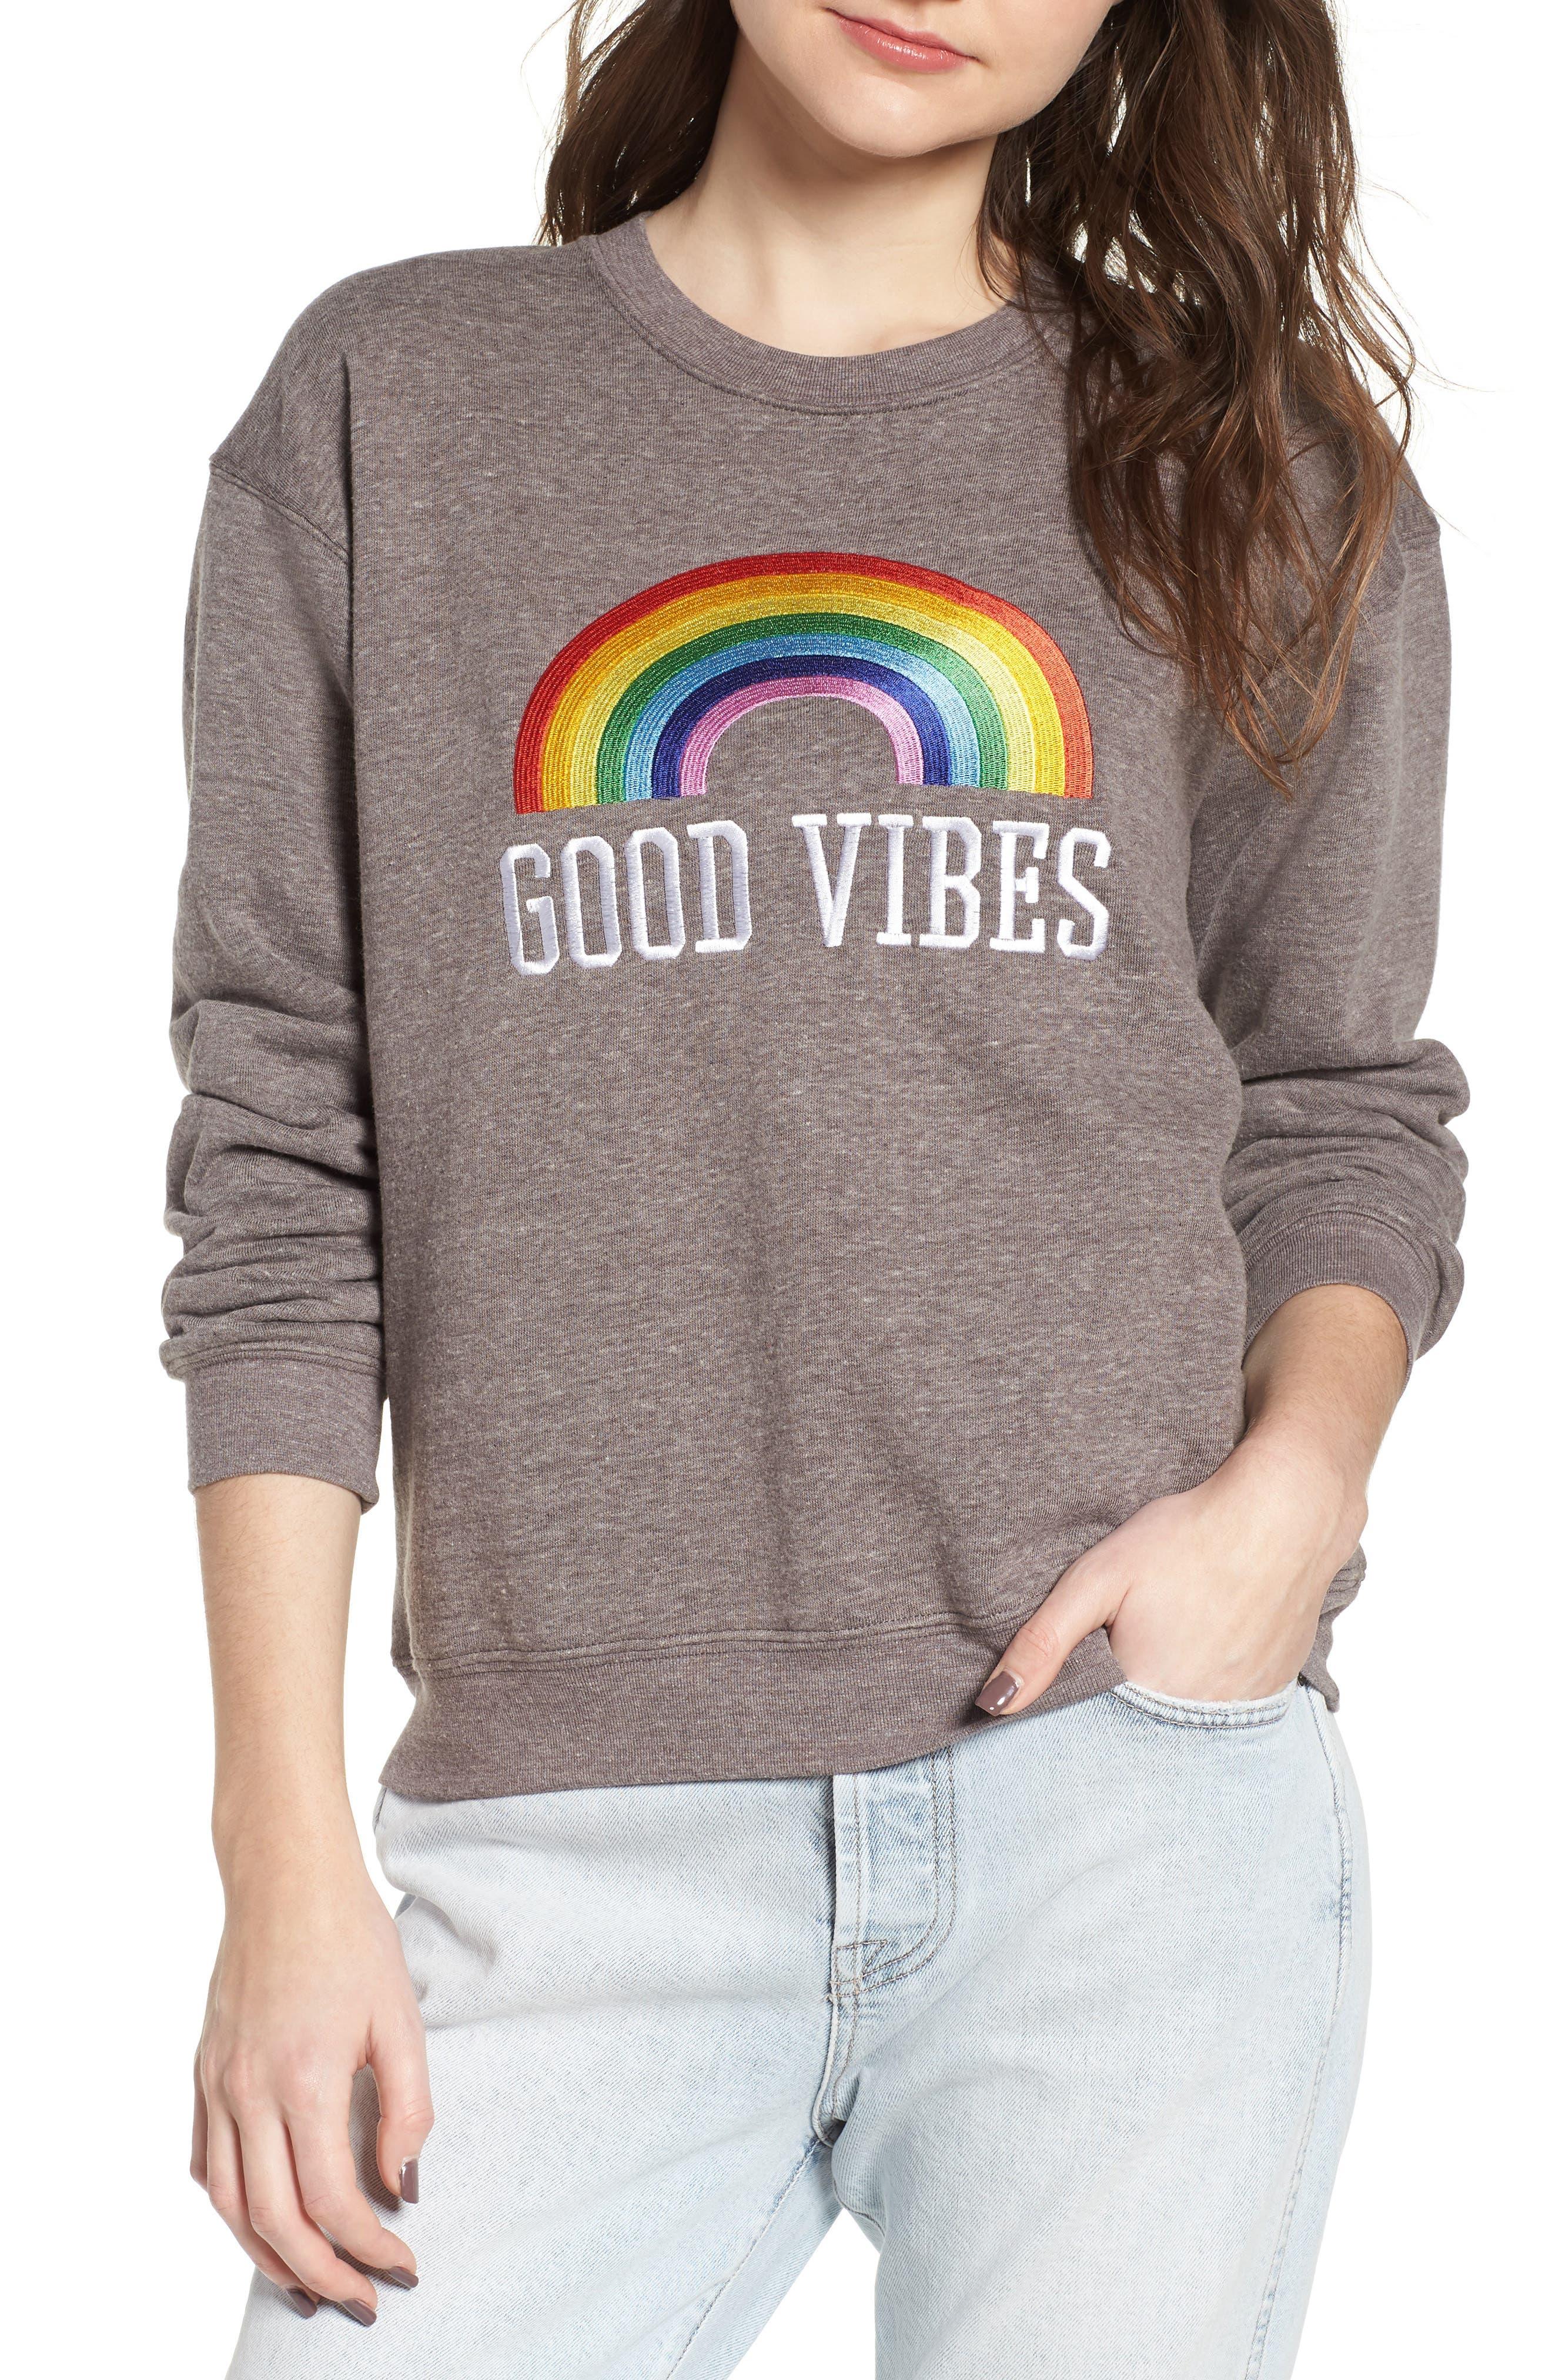 Good Vibes Rainbow Sweatshirt,                             Main thumbnail 1, color,                             Heather Grey